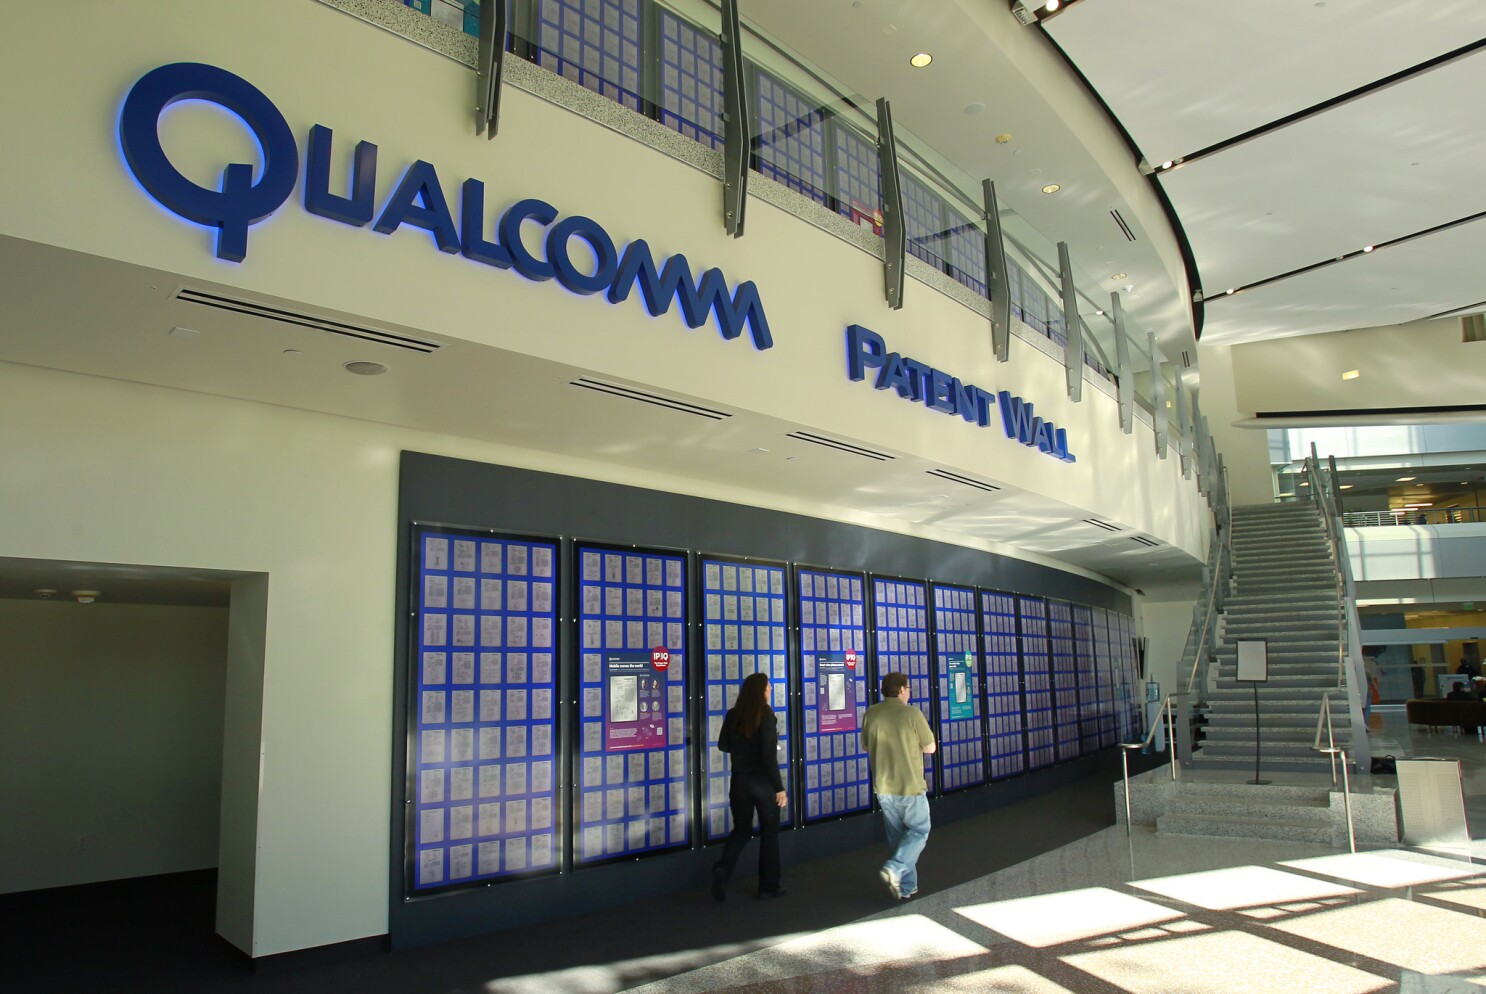 Qualcomm loses bid to overturn $873 million fine in South Korea